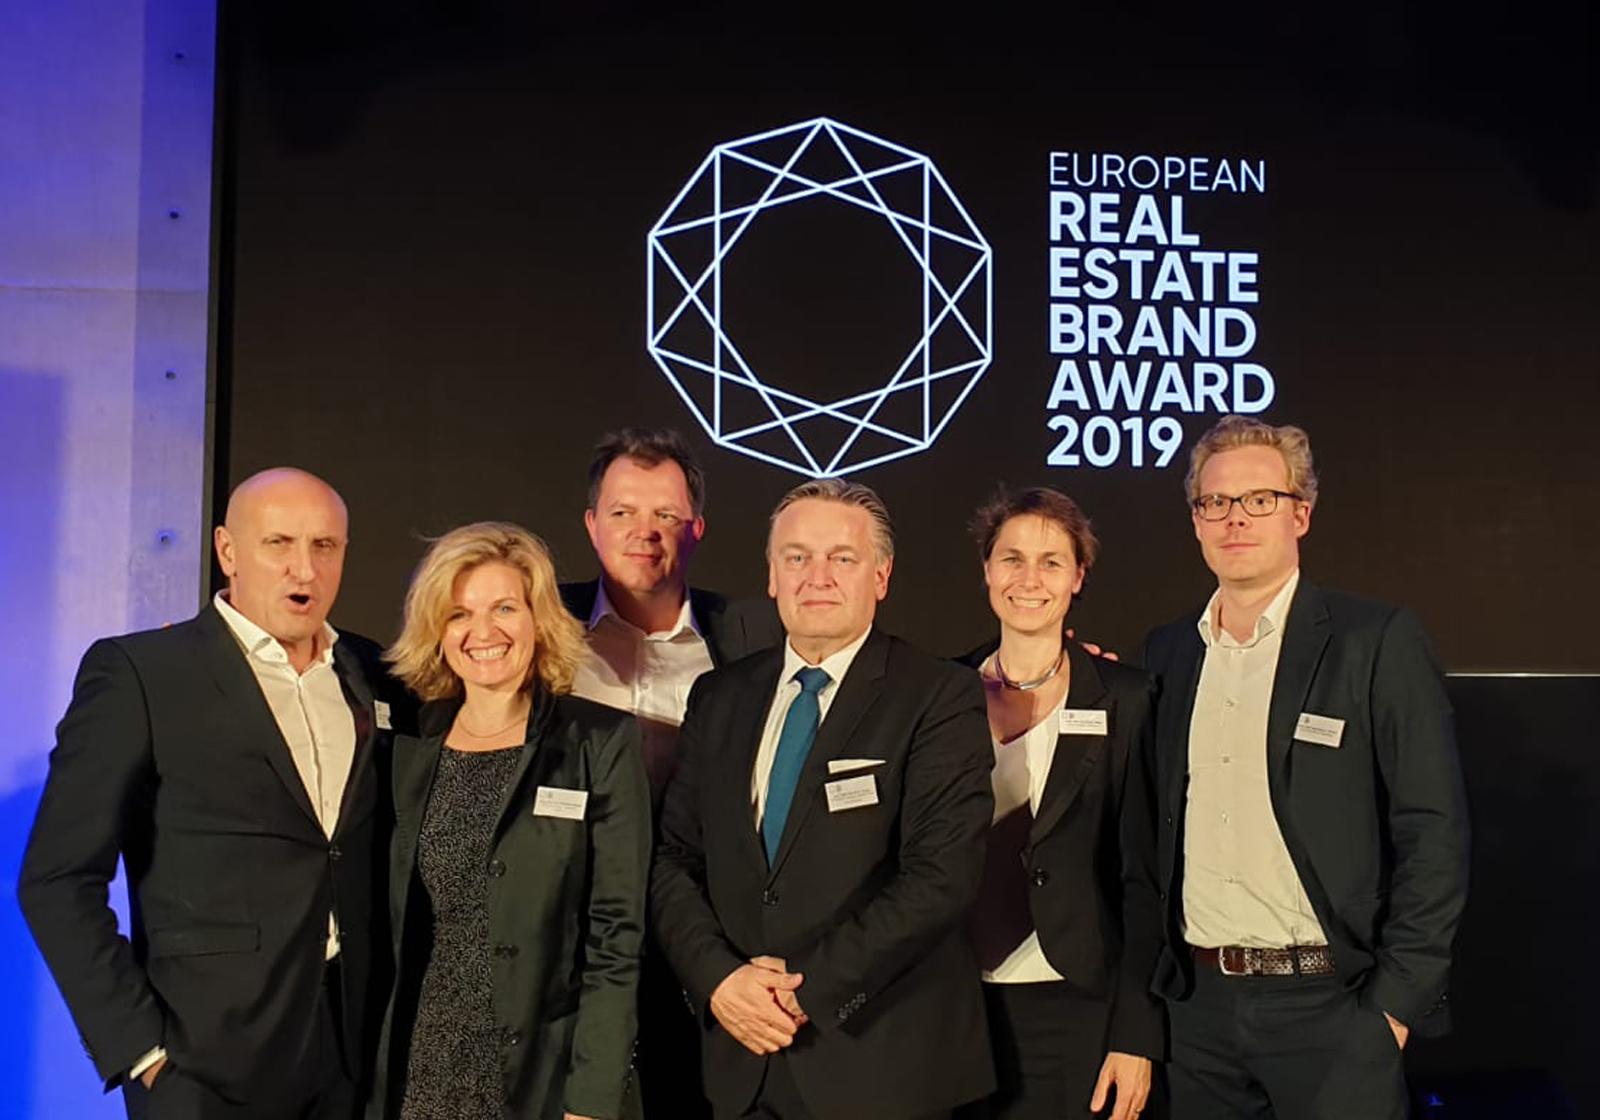 v. l. Horst Reiner, Michaela Hauser, Werner Kahr, Dario Travaš, Miriam Haag und Niklas Veelken nahmen den Real Estate Brand Award entgegen. Foto: ATP/Haag